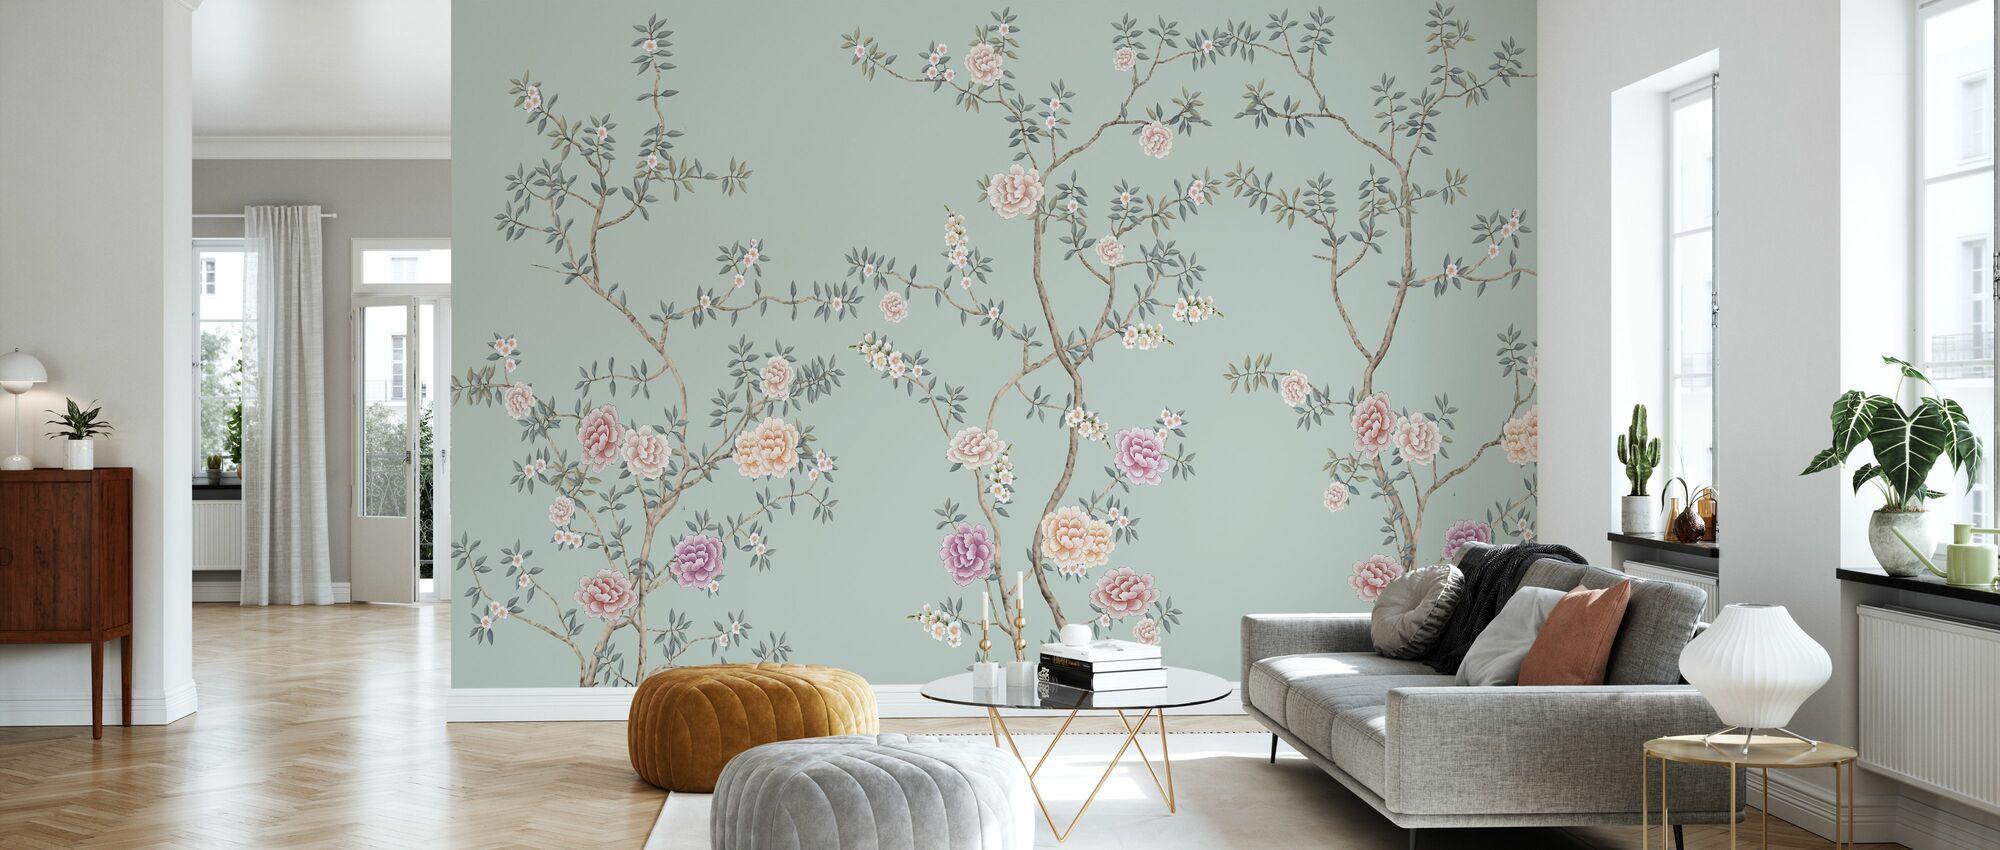 Vegetables - Emerald - Wallpaper - Living Room